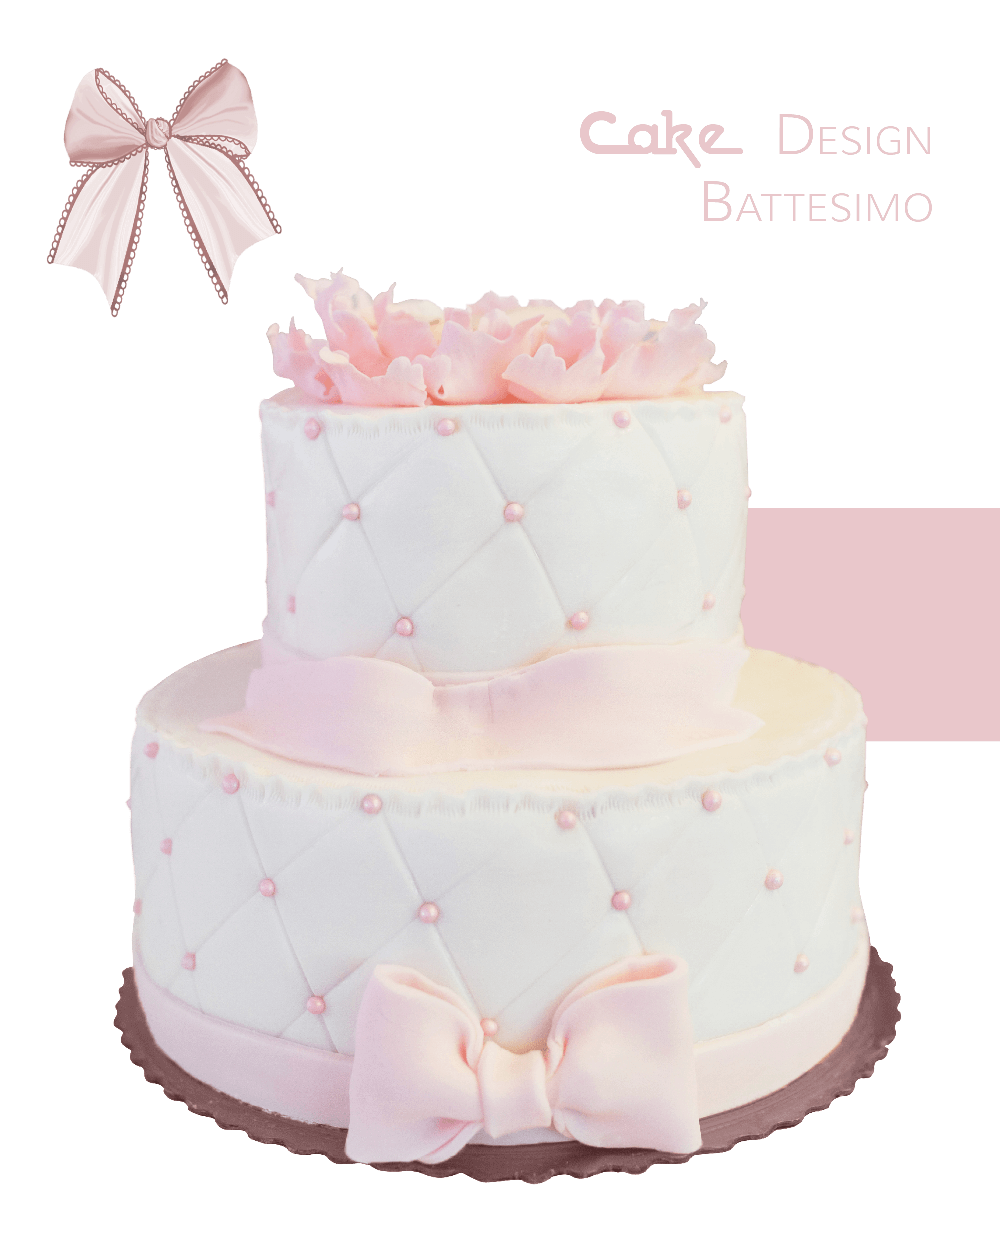 CAKE-DESIGN-BATTESIMO-2-responsive